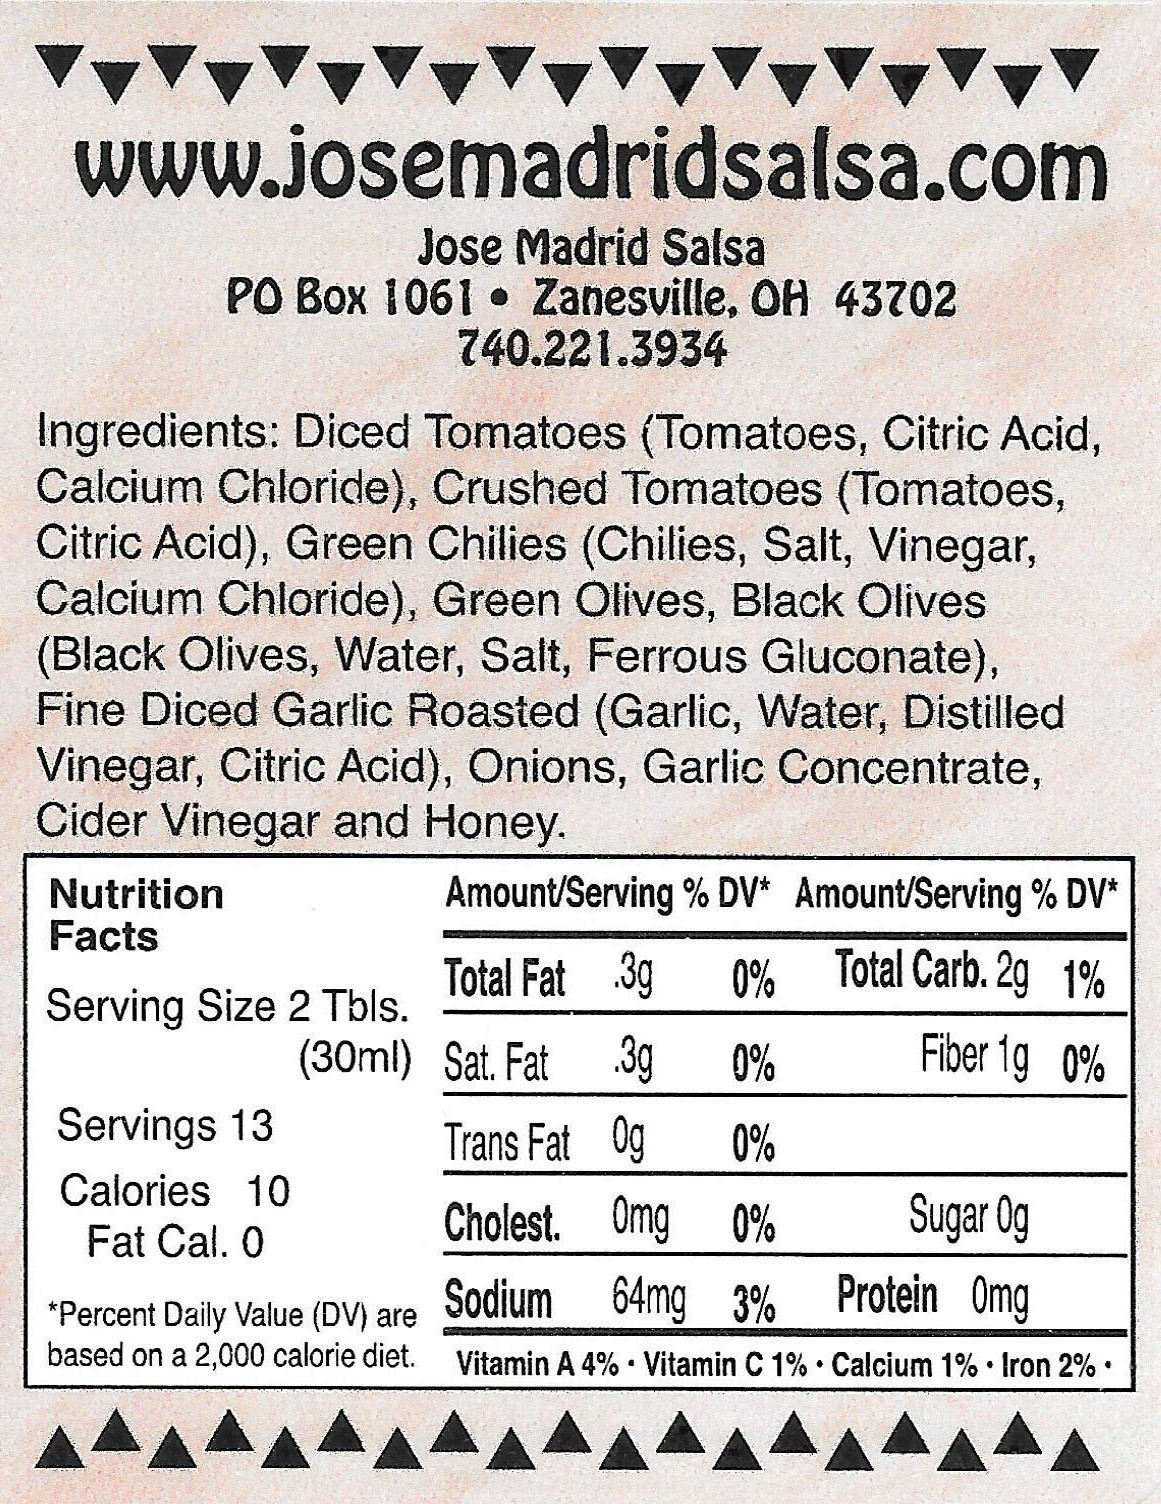 roasted-garlic-and-olives-ingredients.jpg